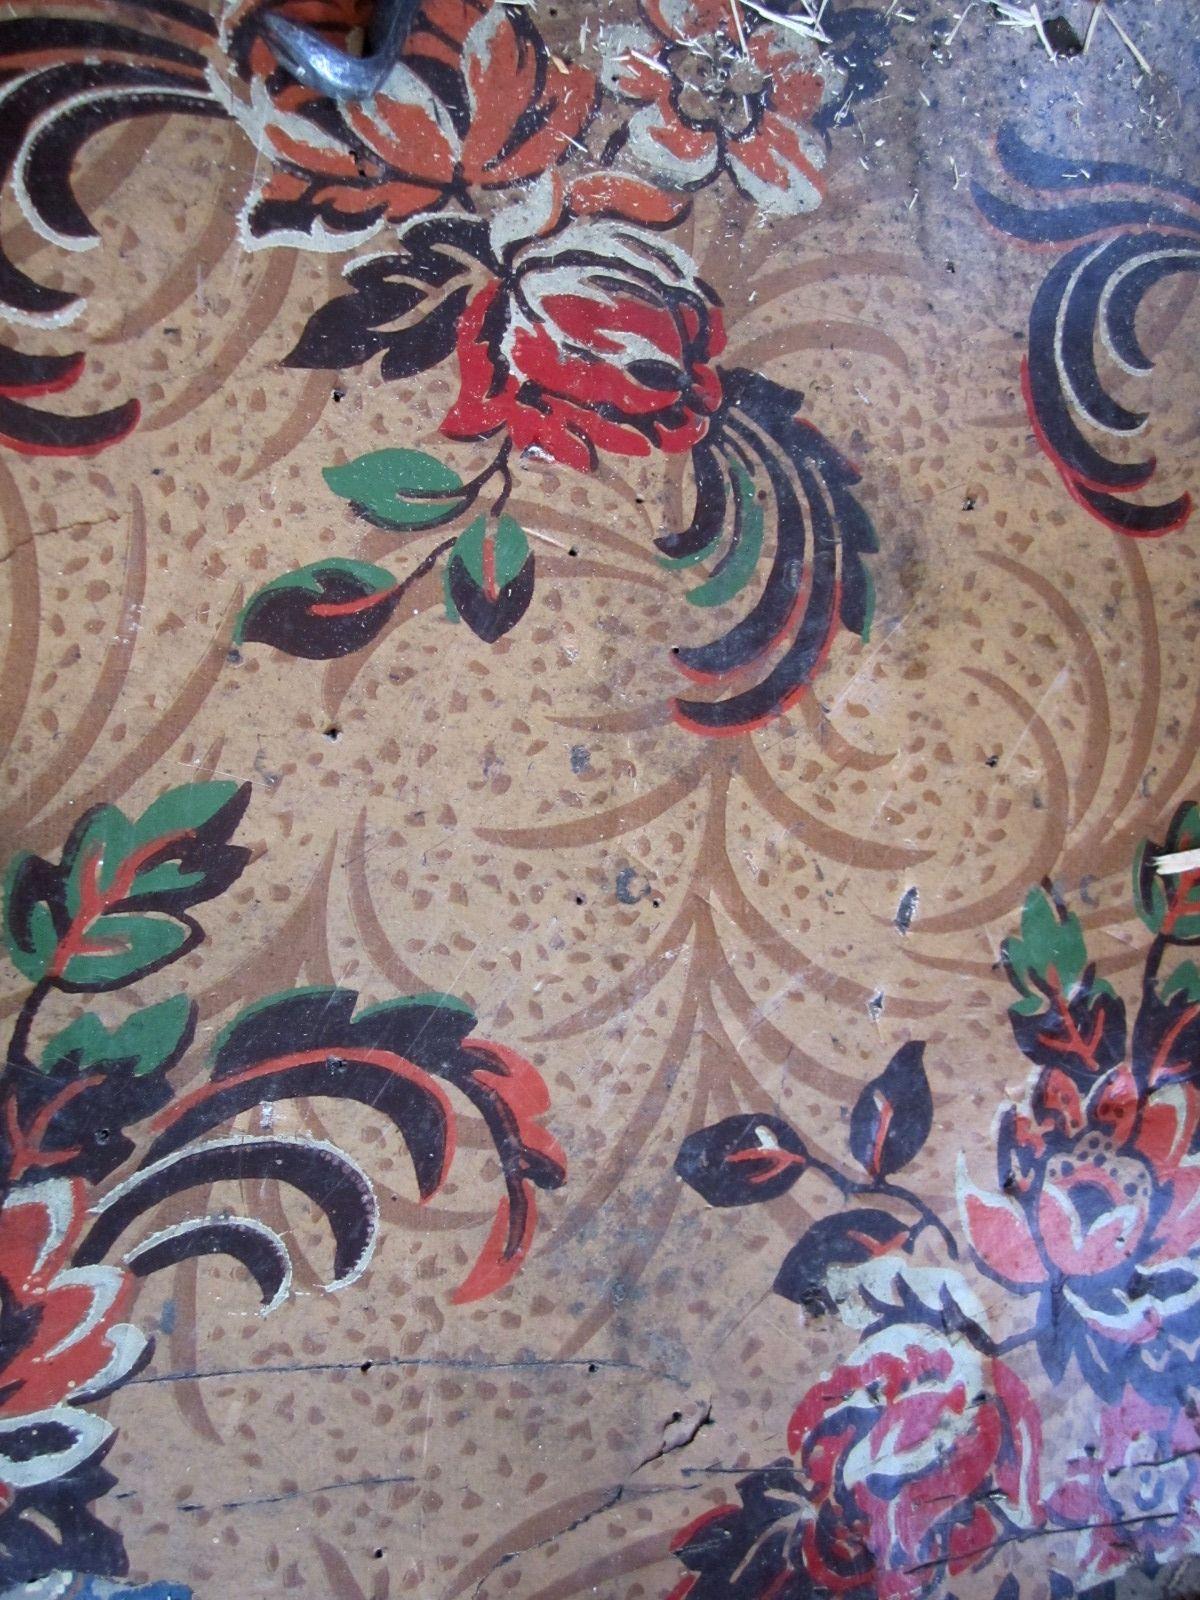 Old Linoleum Patterns Floral Carpet Vintage Floor Linoleum Flooring